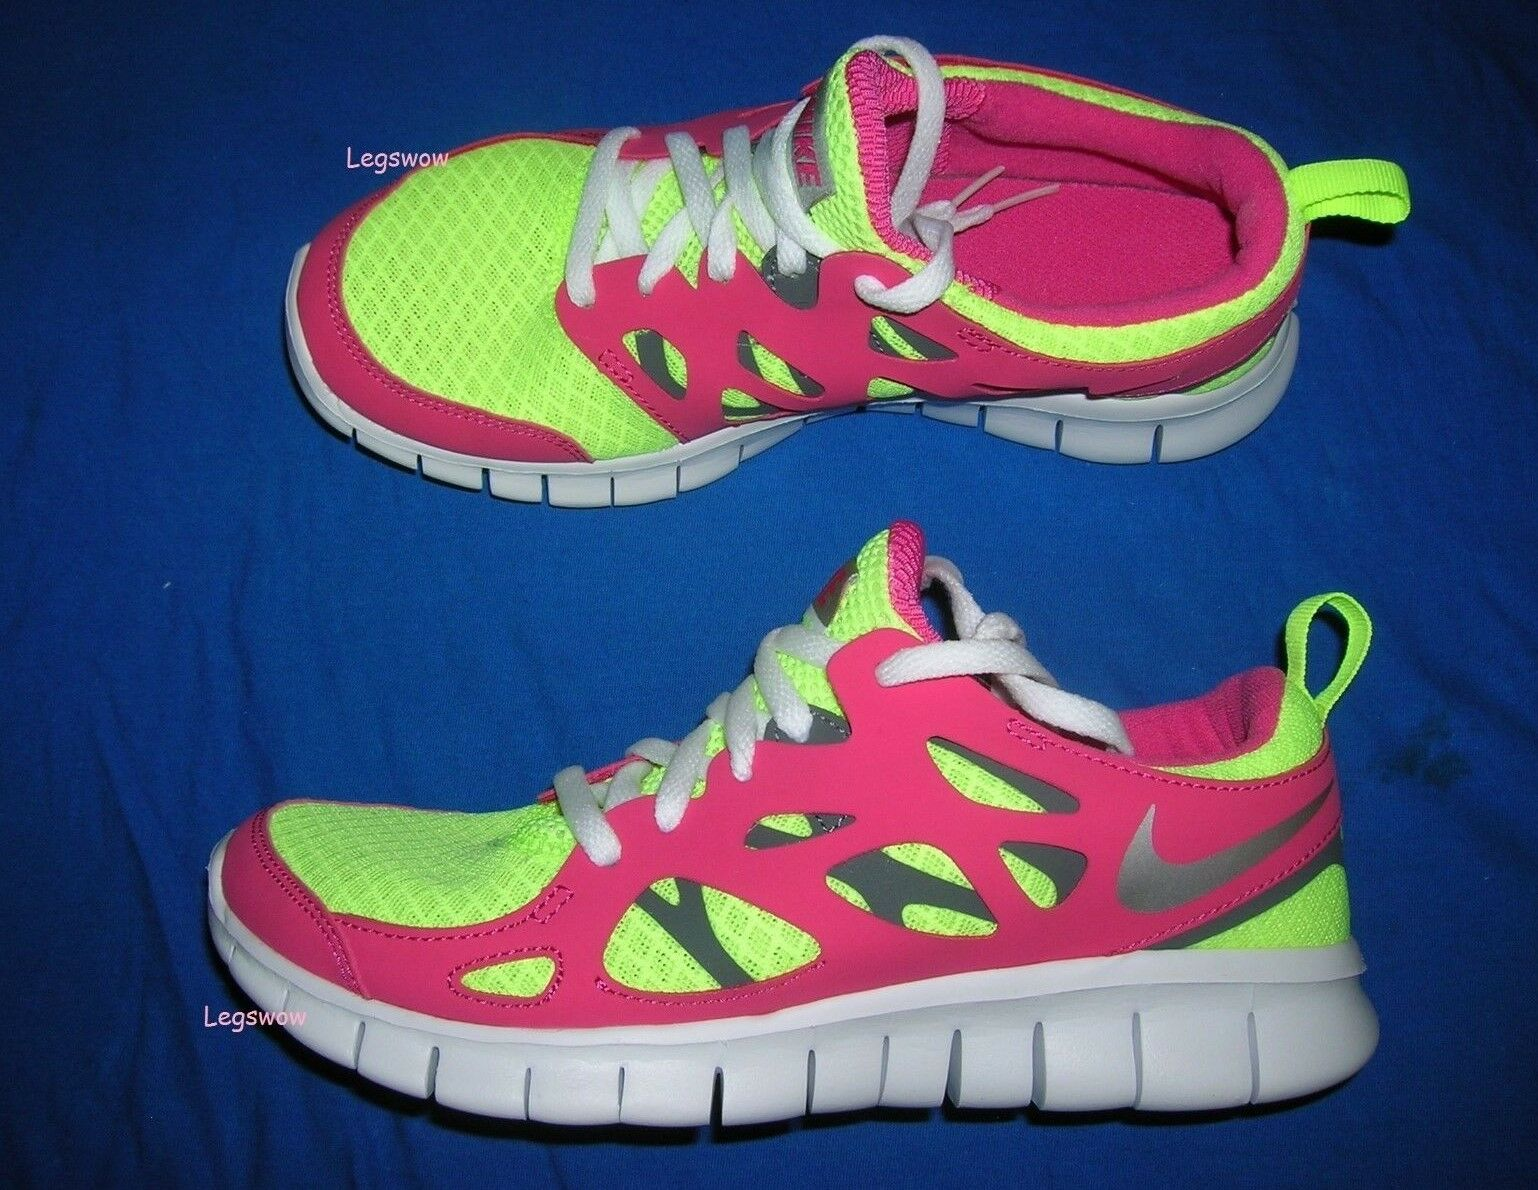 Nike air max 1 essenziale wmns nero / bianco nero / bianco